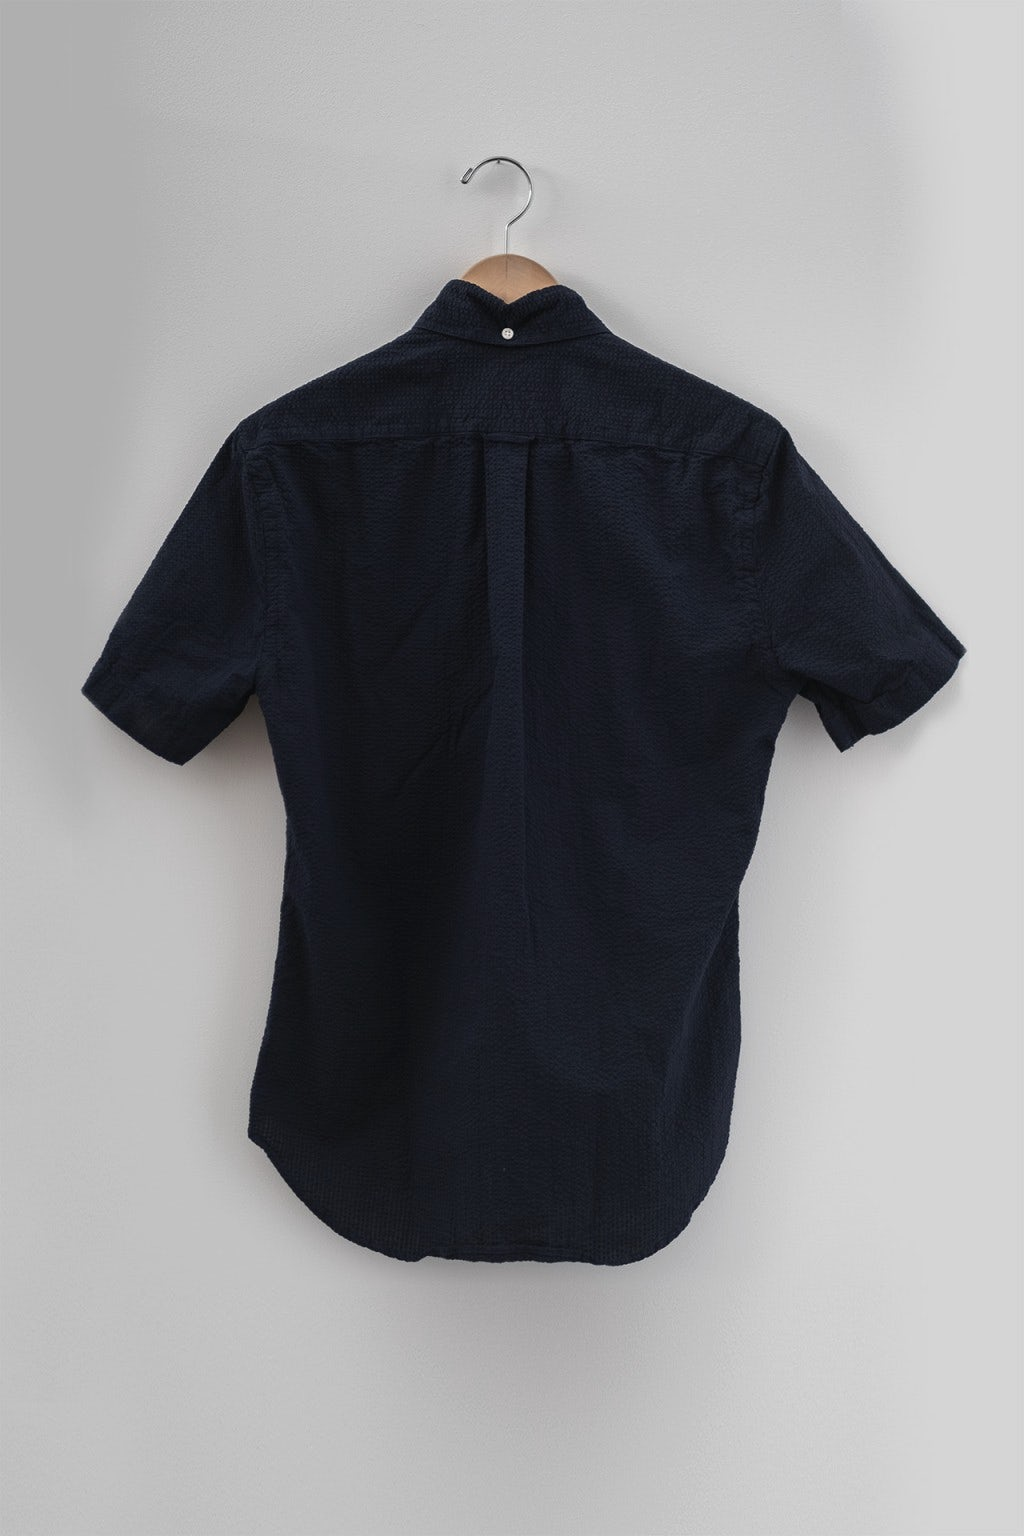 Gitman Bros. Vintage Short Sleeve Navy Seersucker